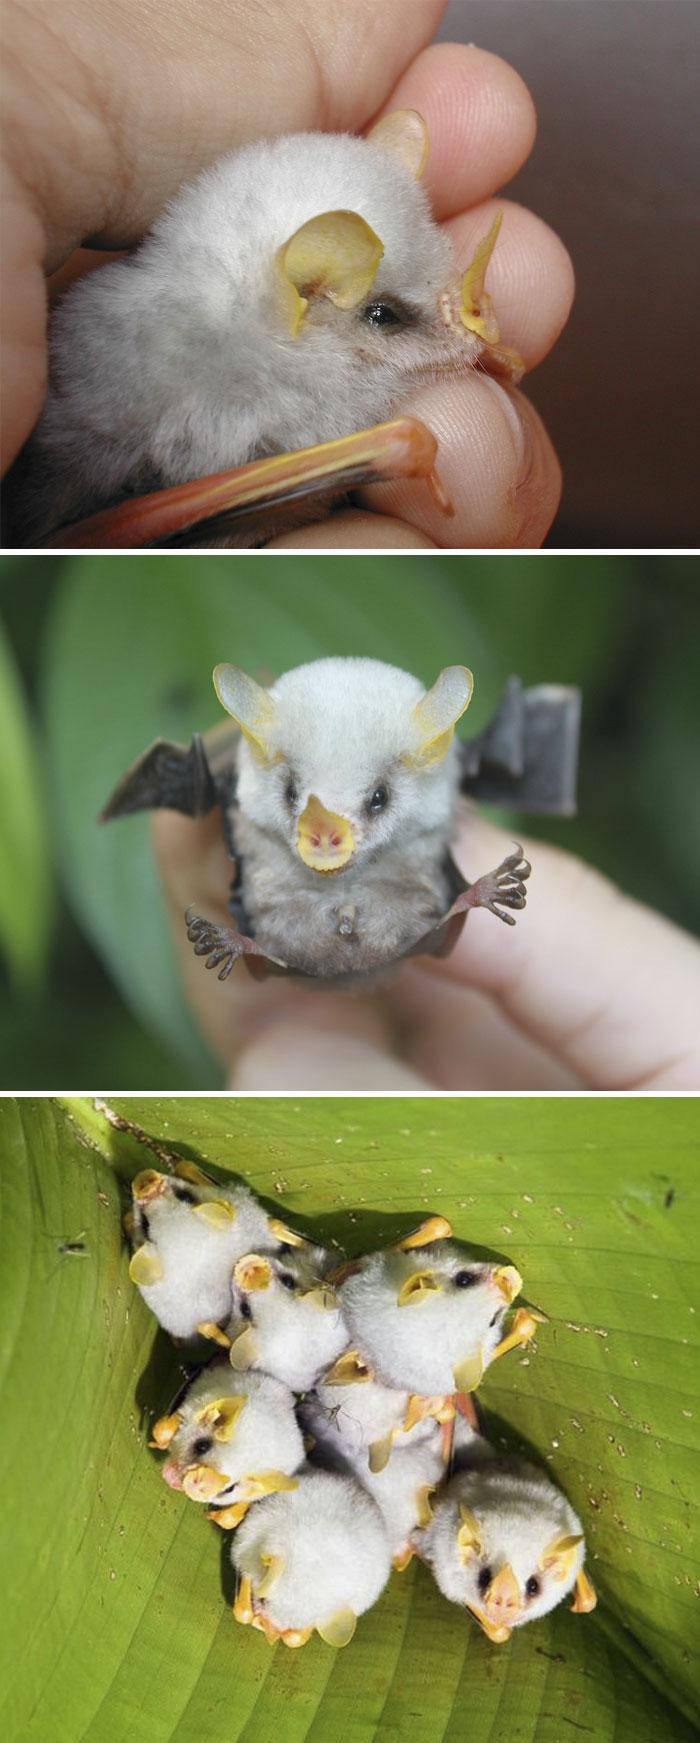 Rare Animal Babies You've Never Seen Before - 8. Fluffy Honduran White Bat Baby